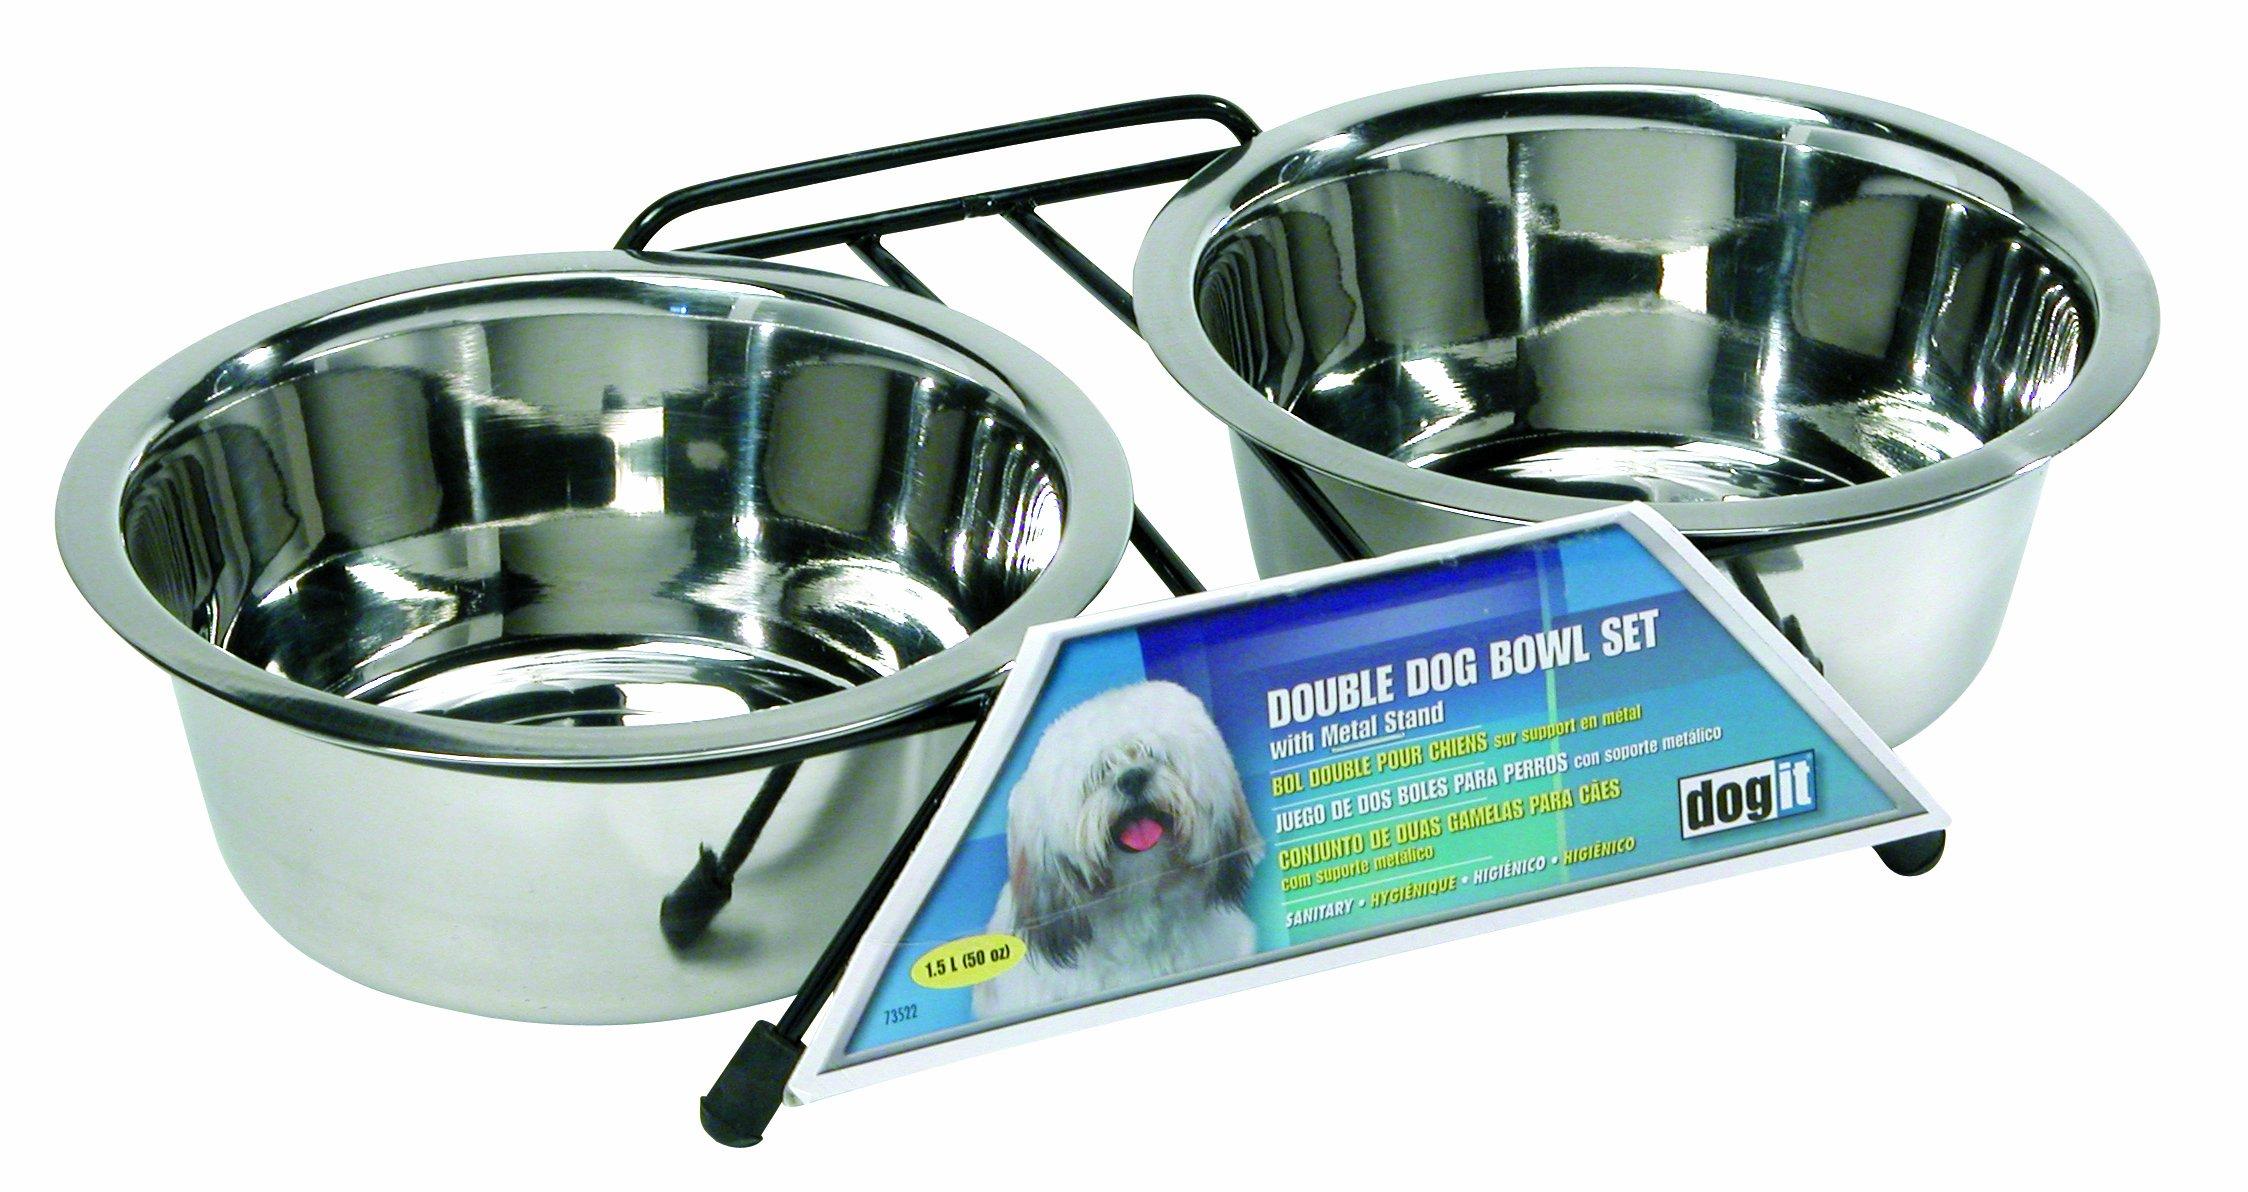 Dogit Stainless Steel Double Dog Diner, Medium